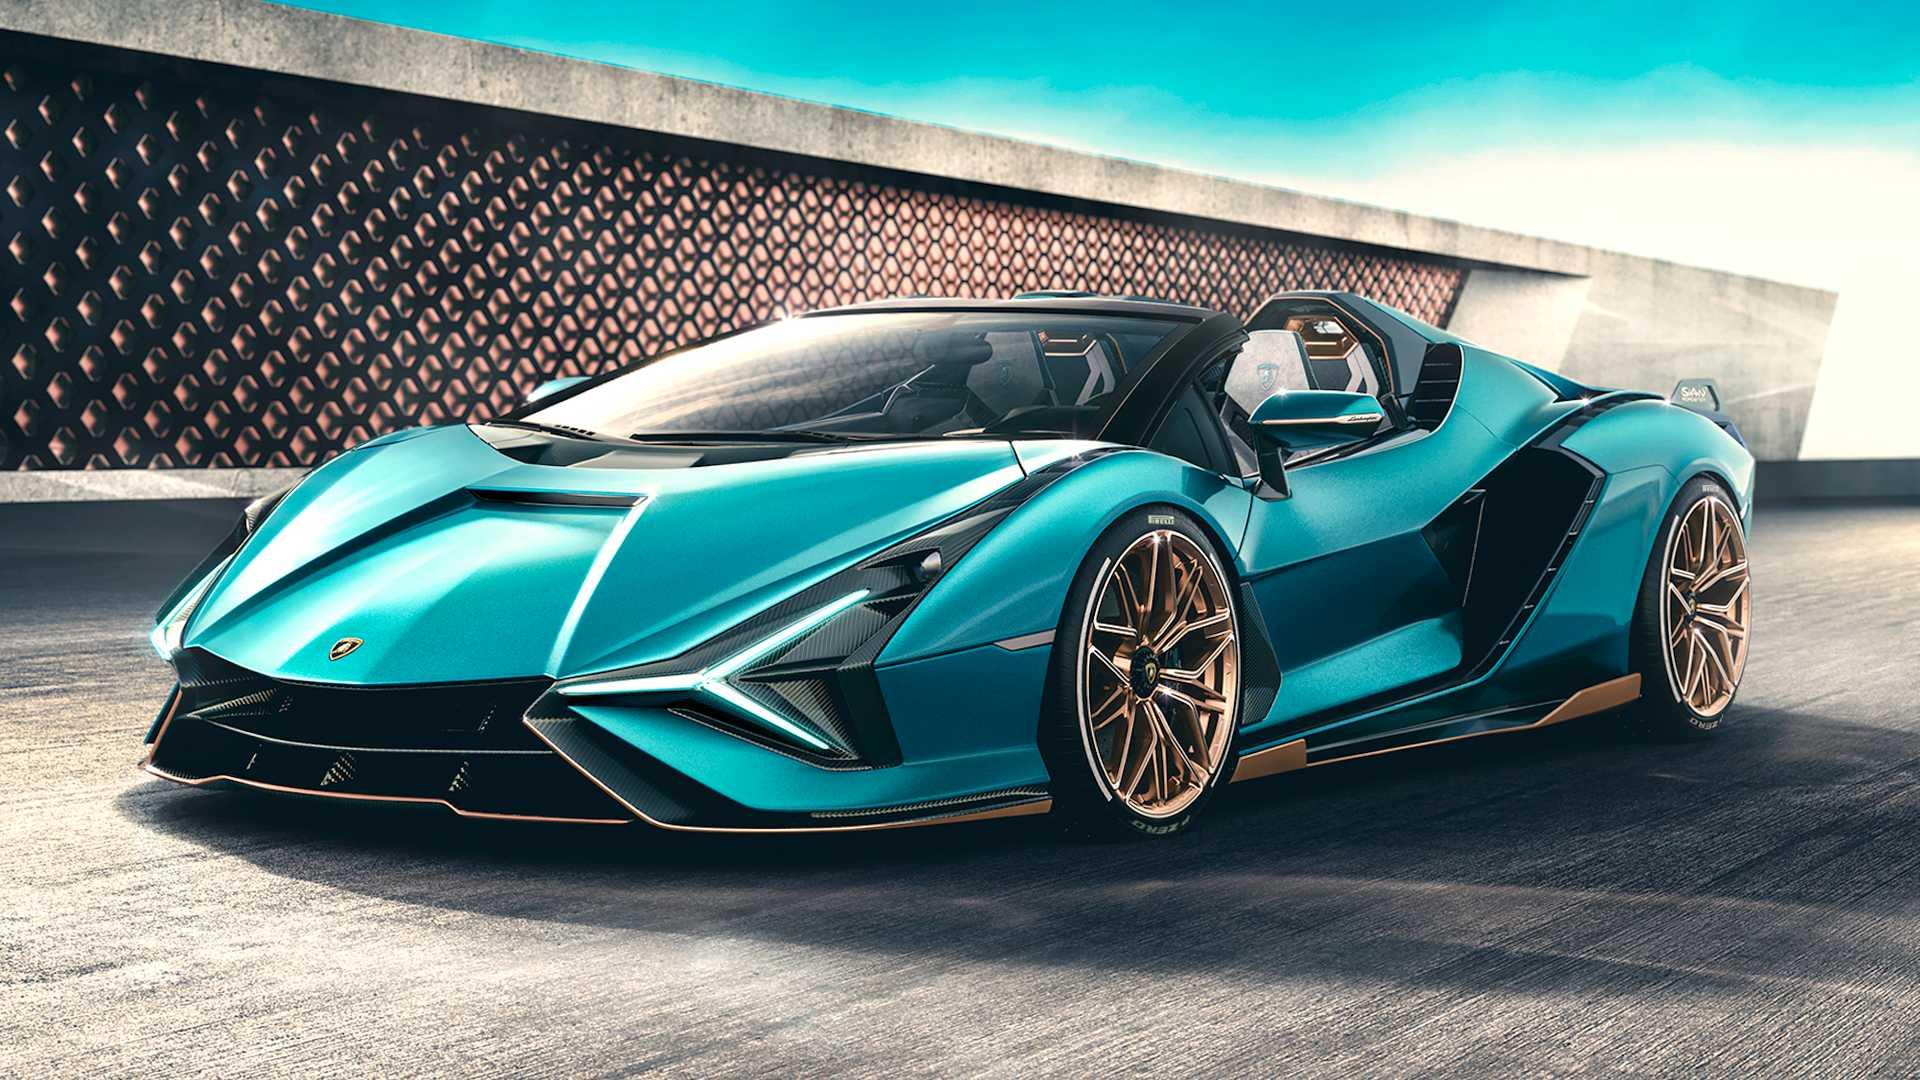 Рассекречен новейший суперкар Lamborghini за $4 миллиона